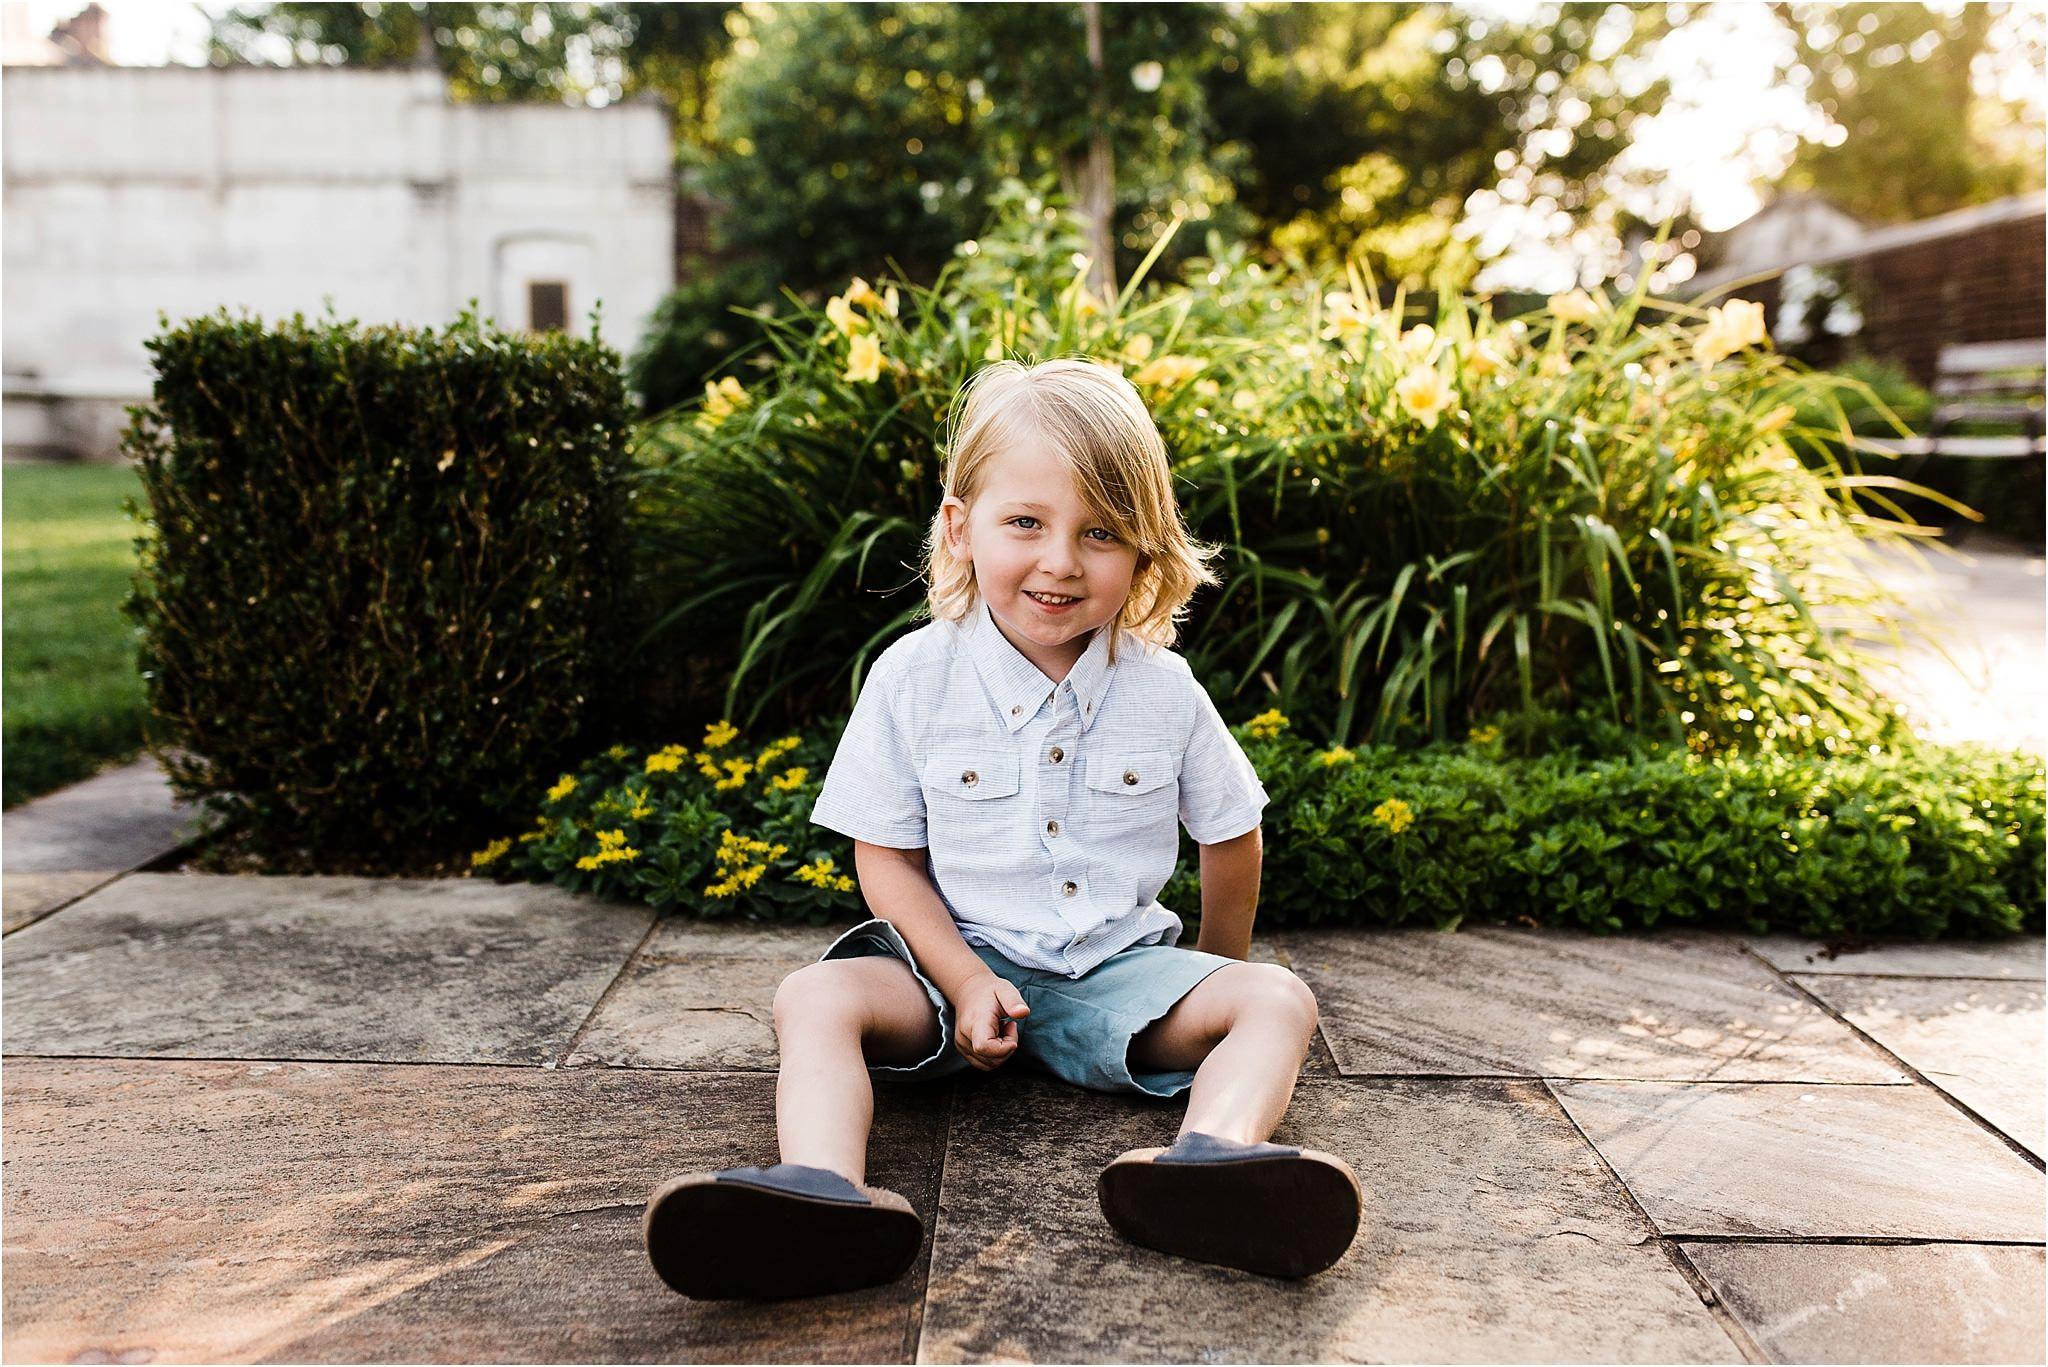 Child photo at Mellon Park